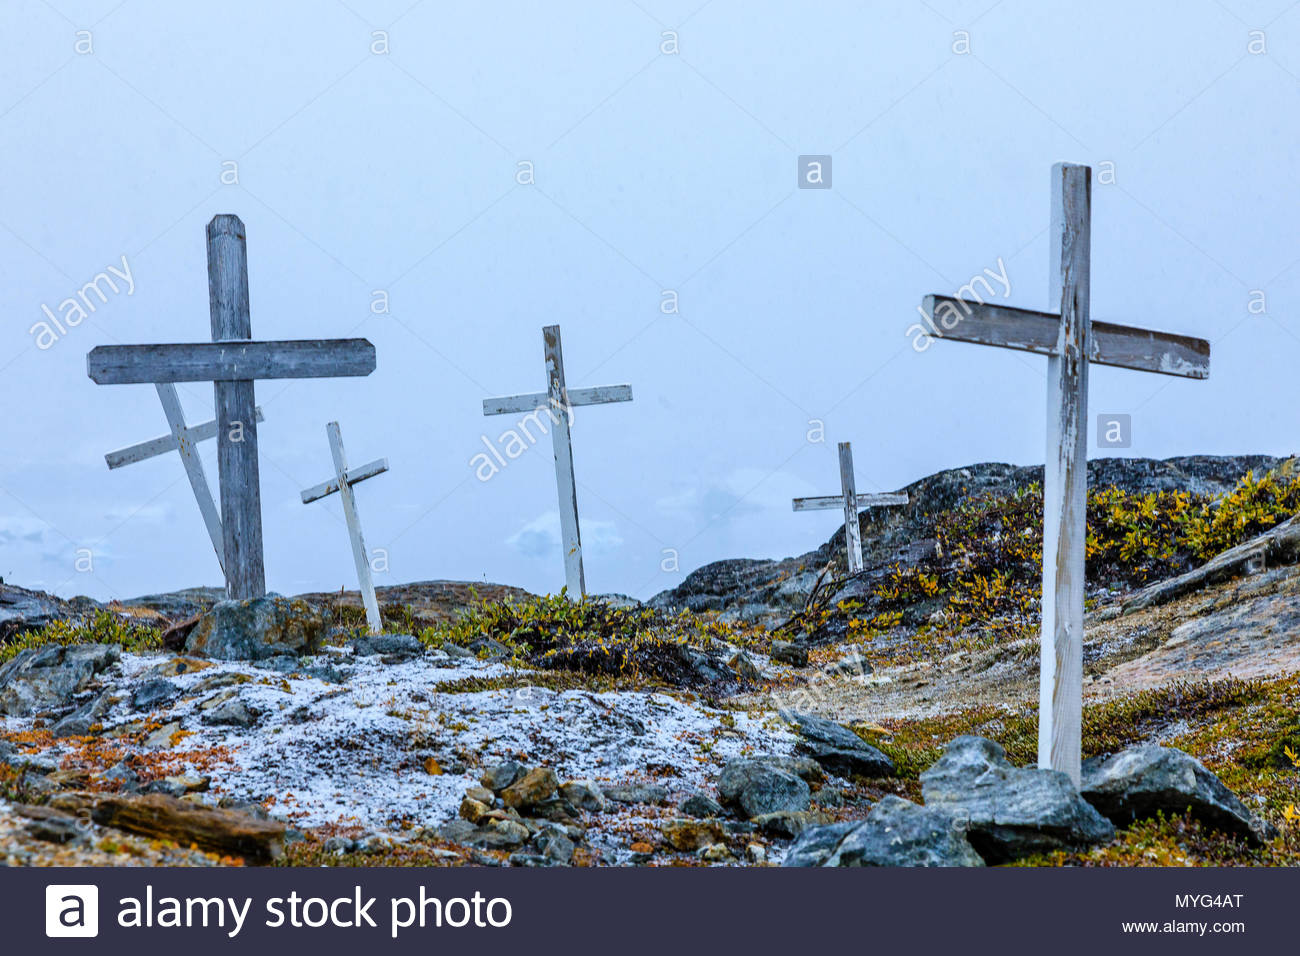 Gravesites in the Inuit village of Tiniteqikaq. - Stock Image